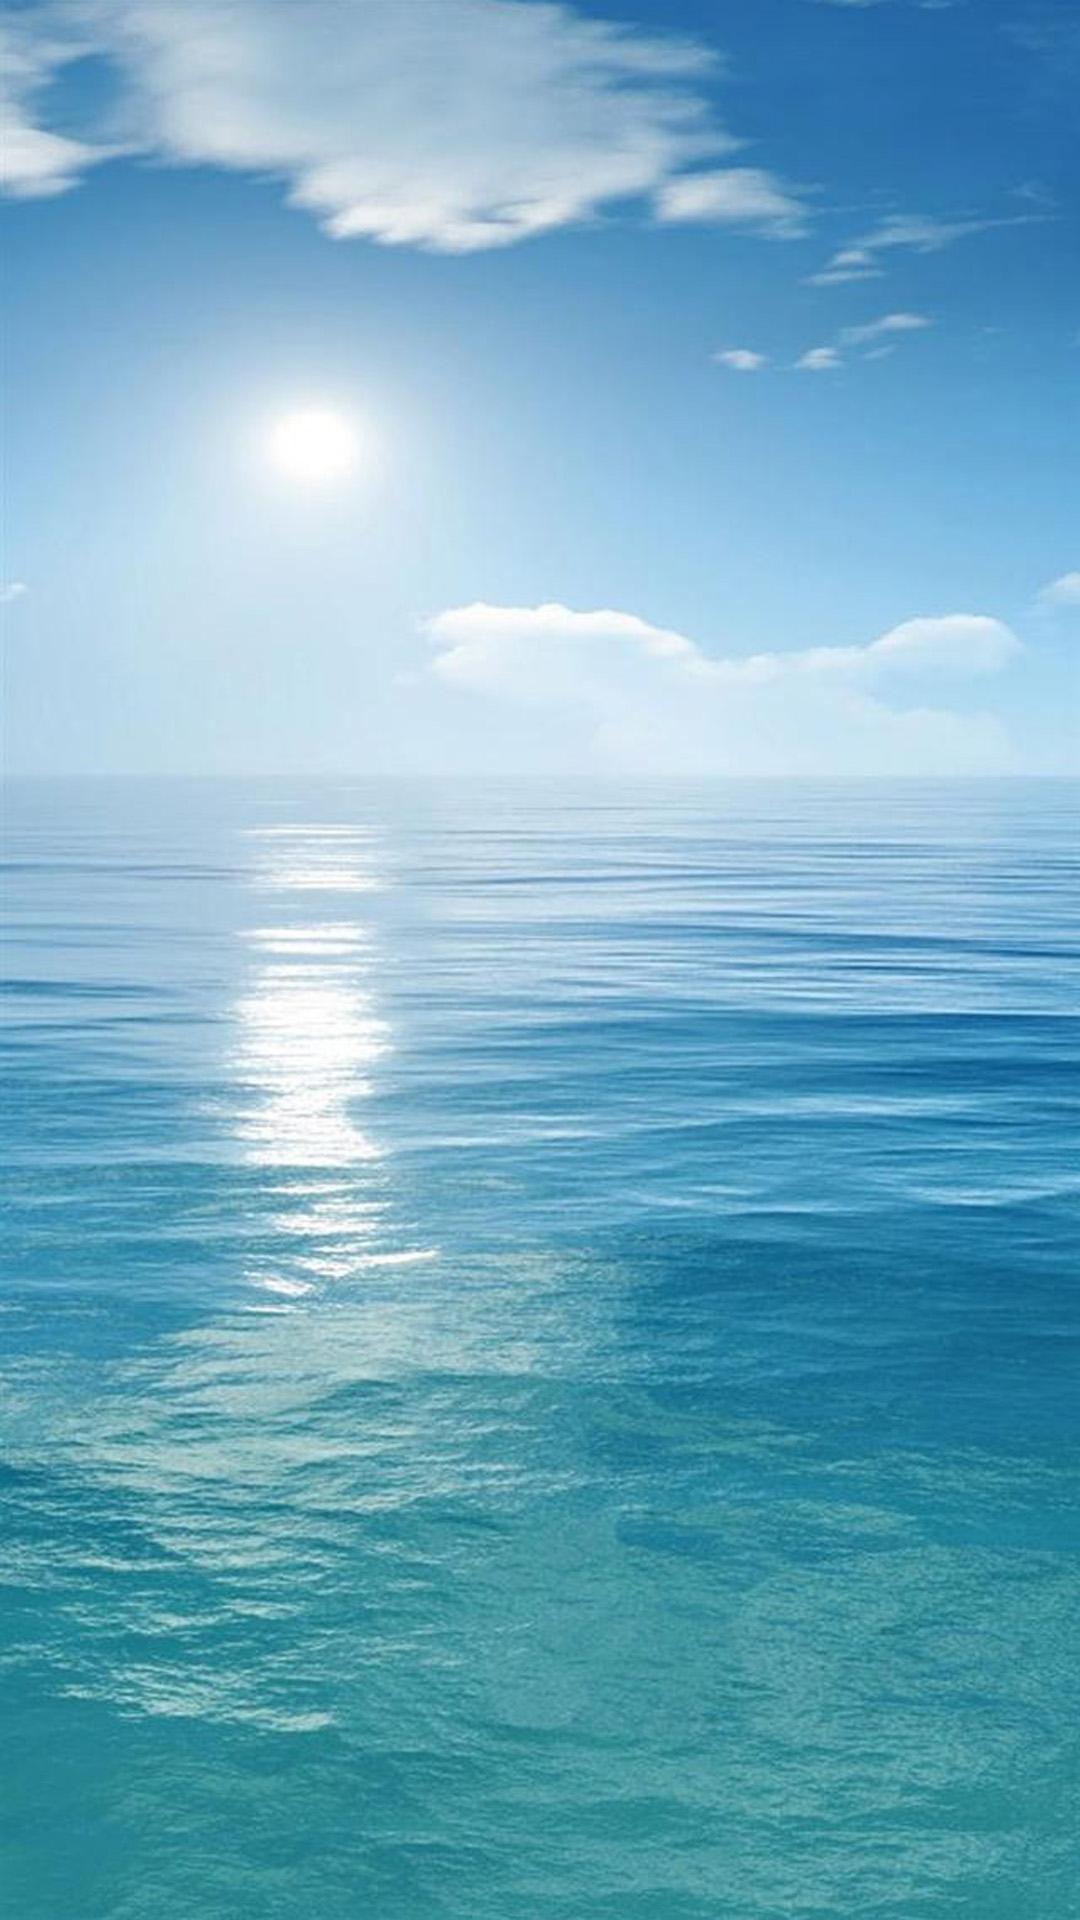 Sunny-Clear-Ocean-Skyline-Landscape-iPhone-6-wallpaper.